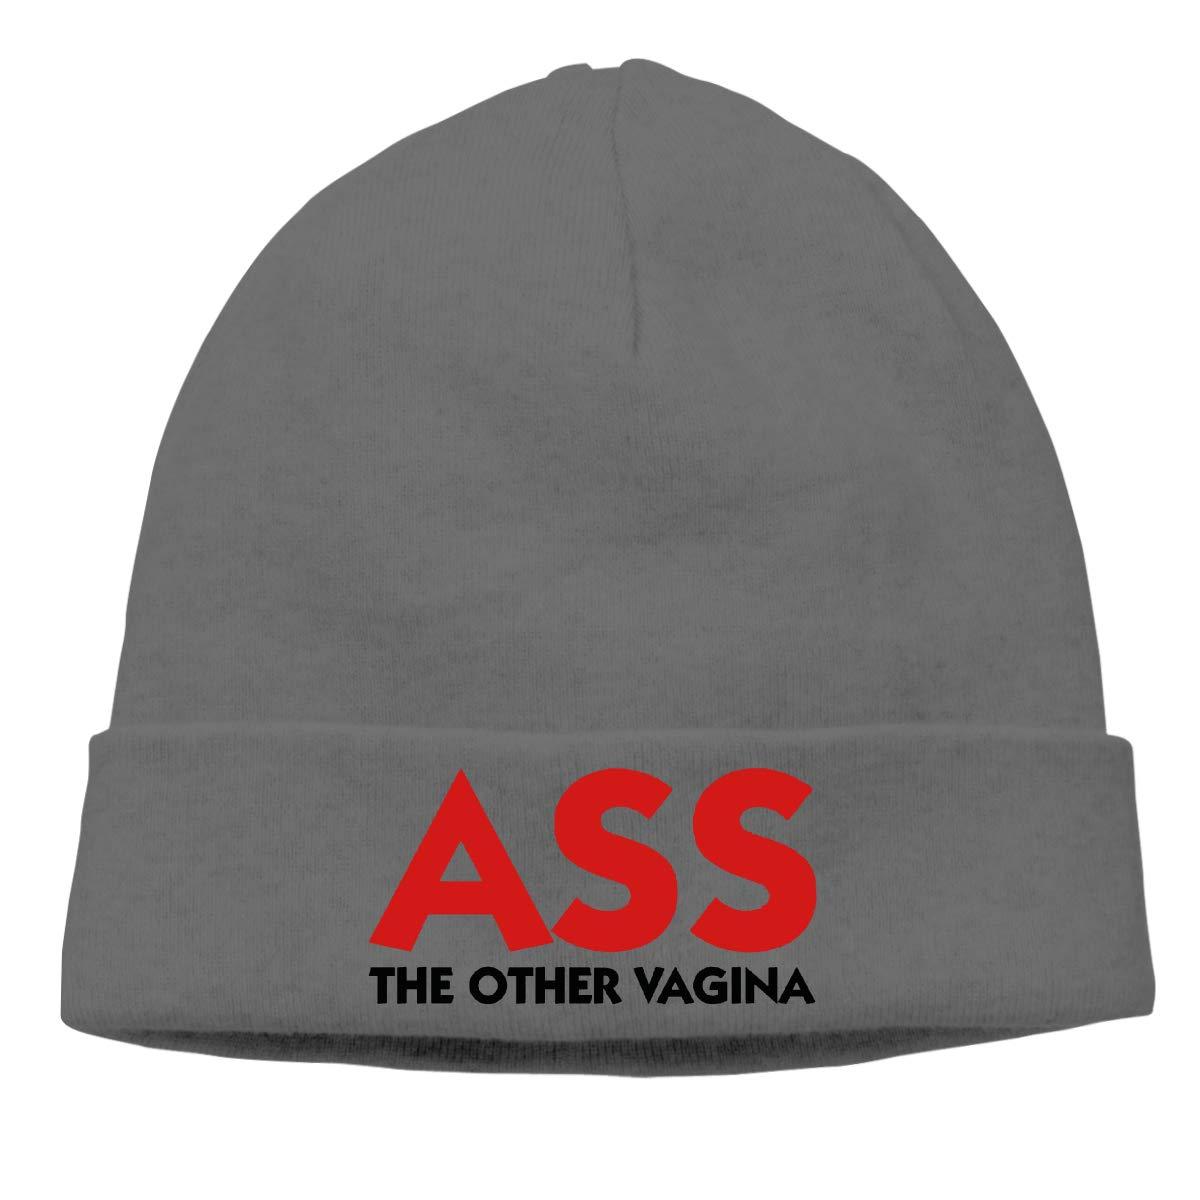 Ass-The Other Vagina Men Women Warm /& Stylish Ski Slouchy Hat